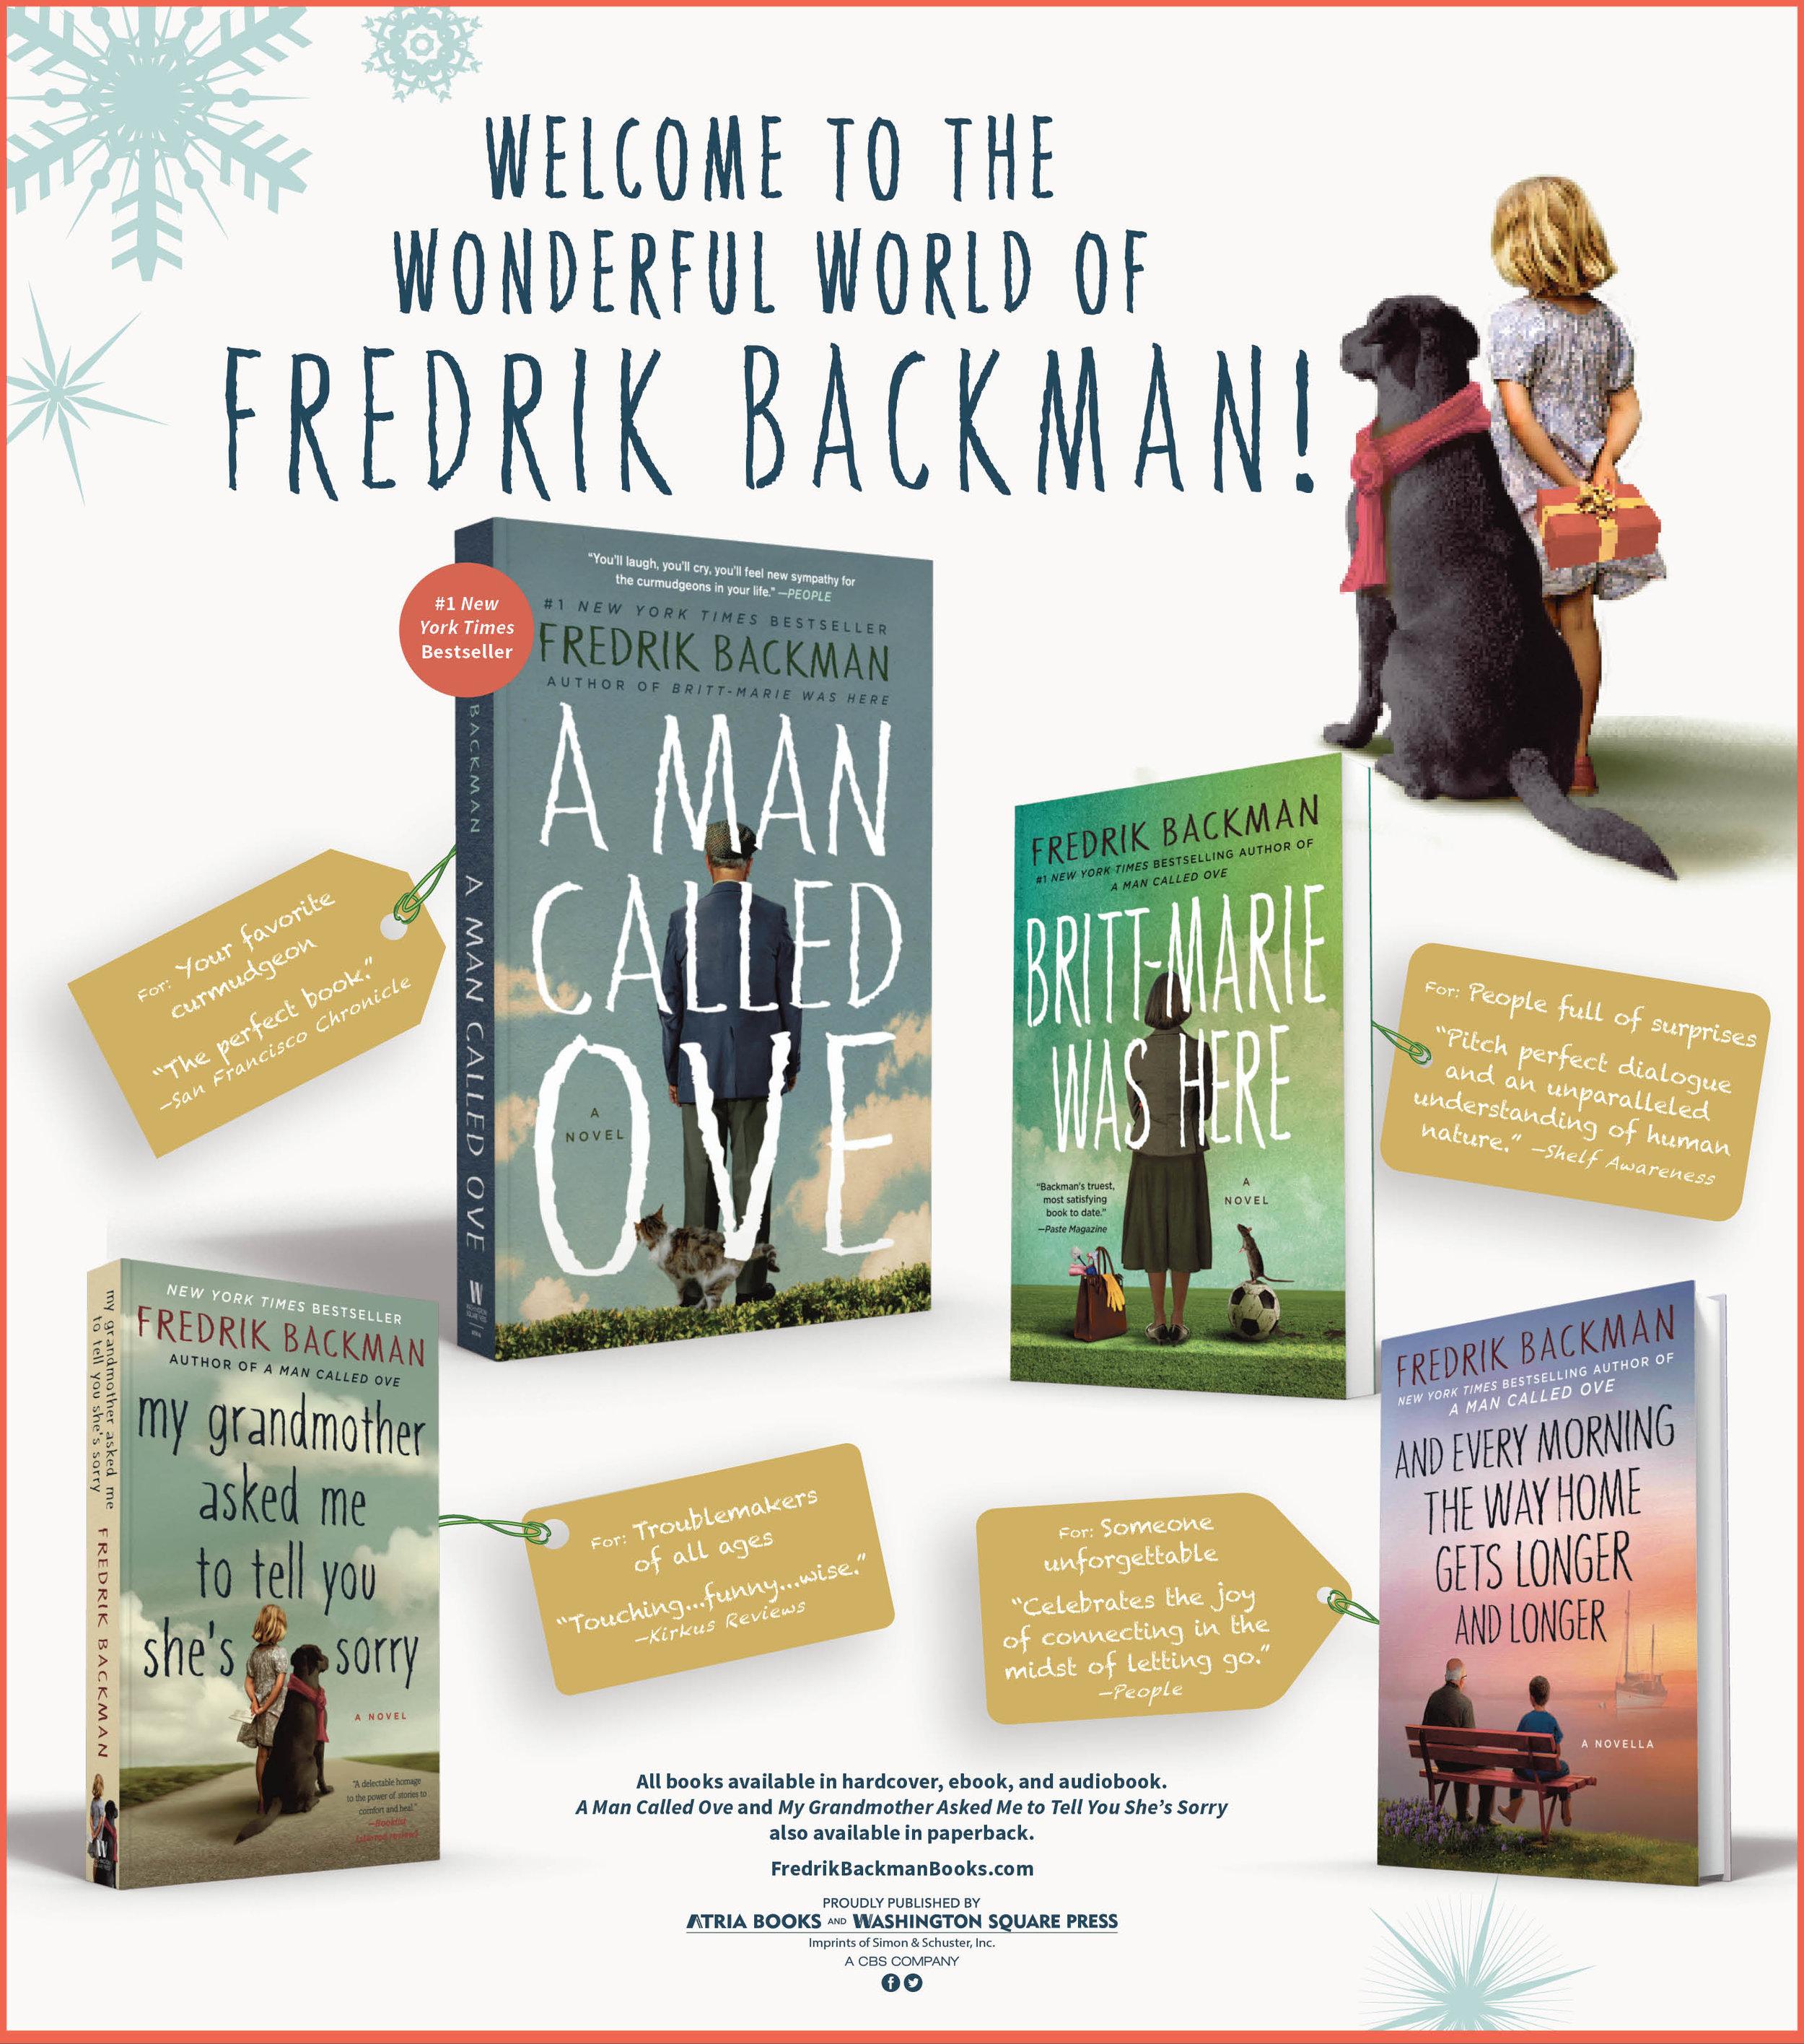 Fredrik Backman holiday advertisement, the New York Times